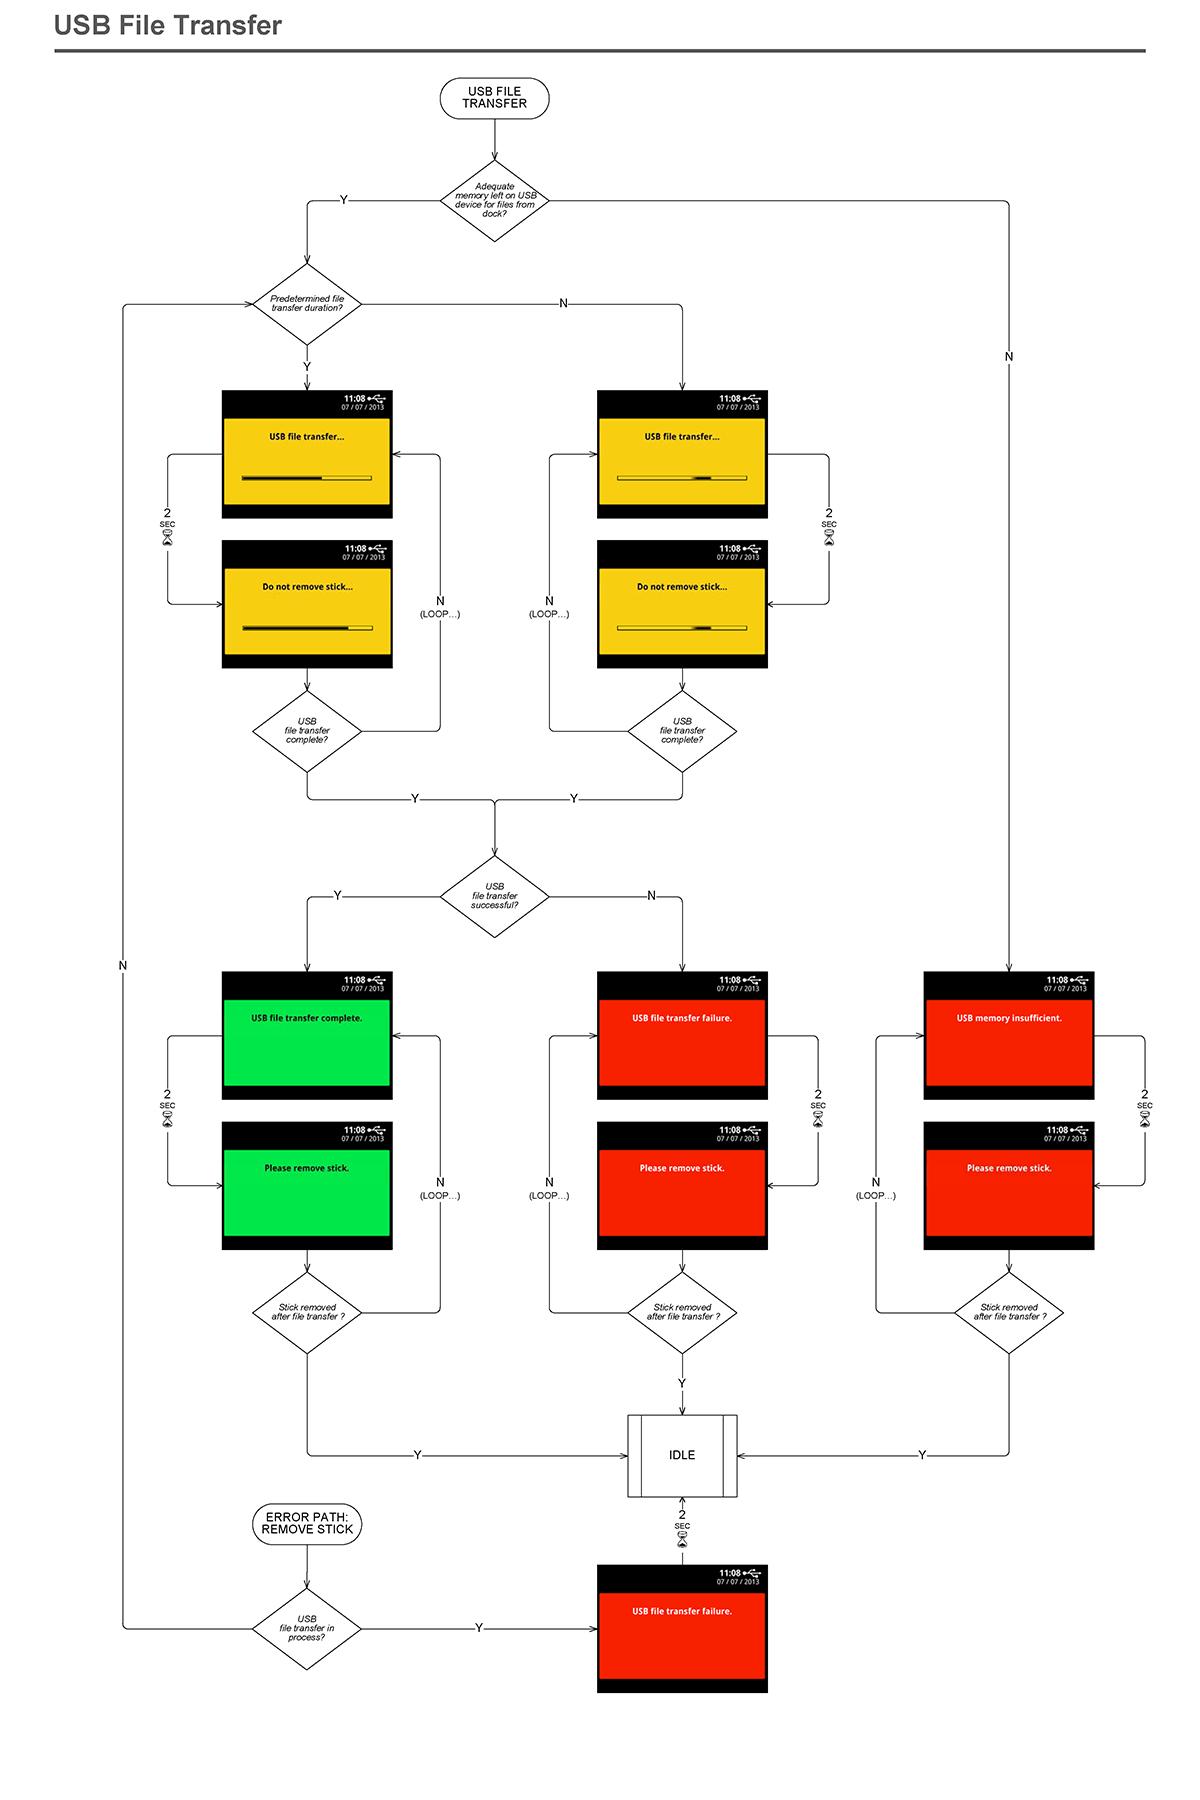 File Transfer via USB Stick